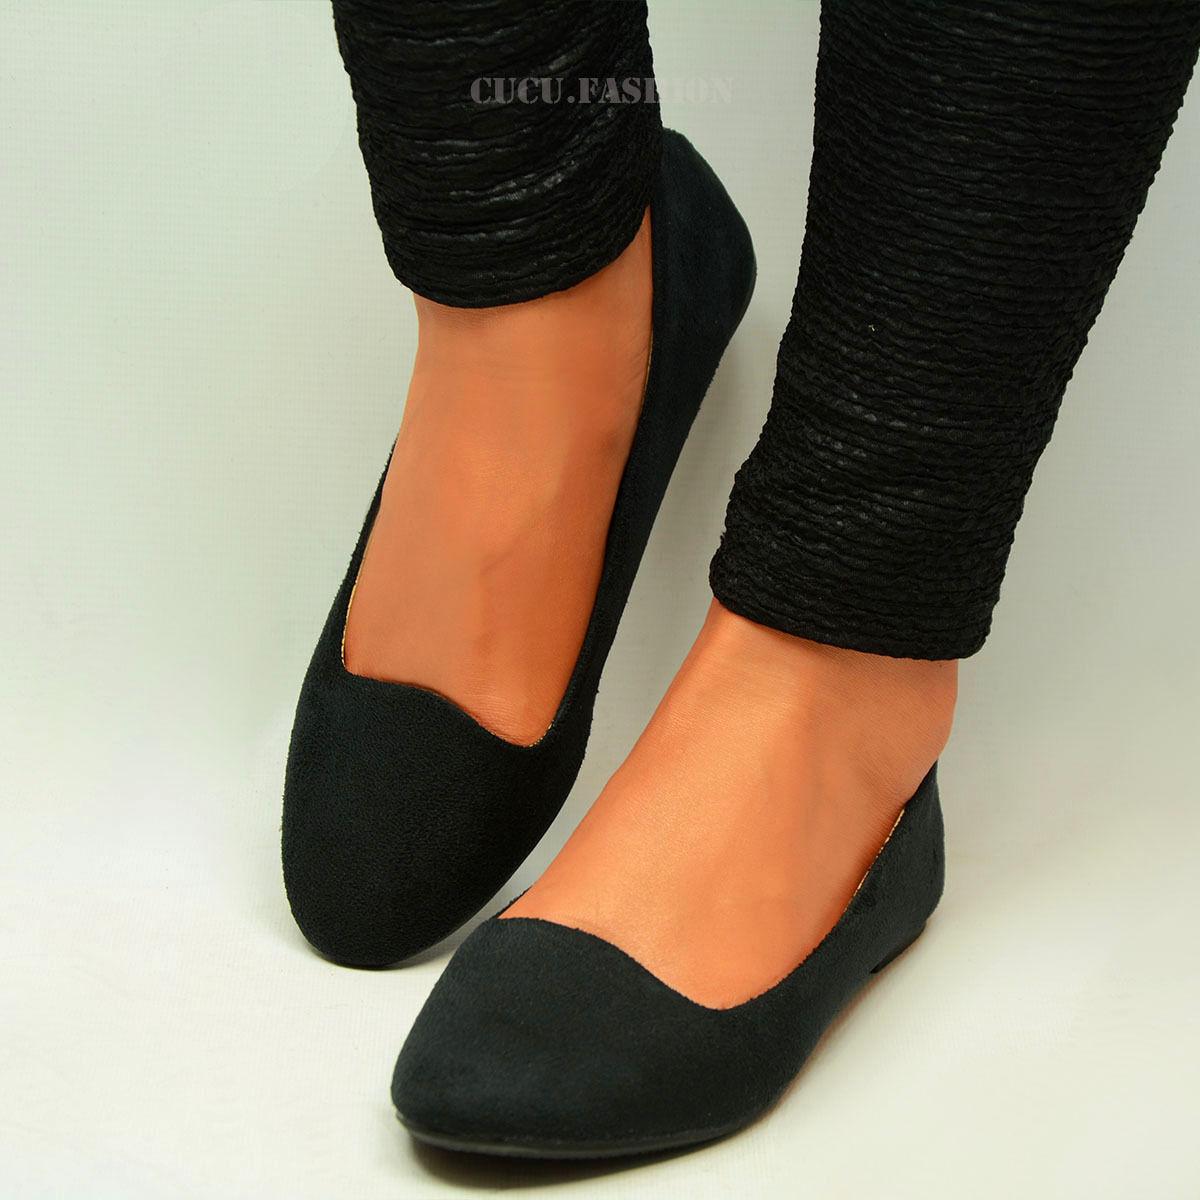 Womens Ballerina Ballet Dolly Pumps Ladies Flat Black ...